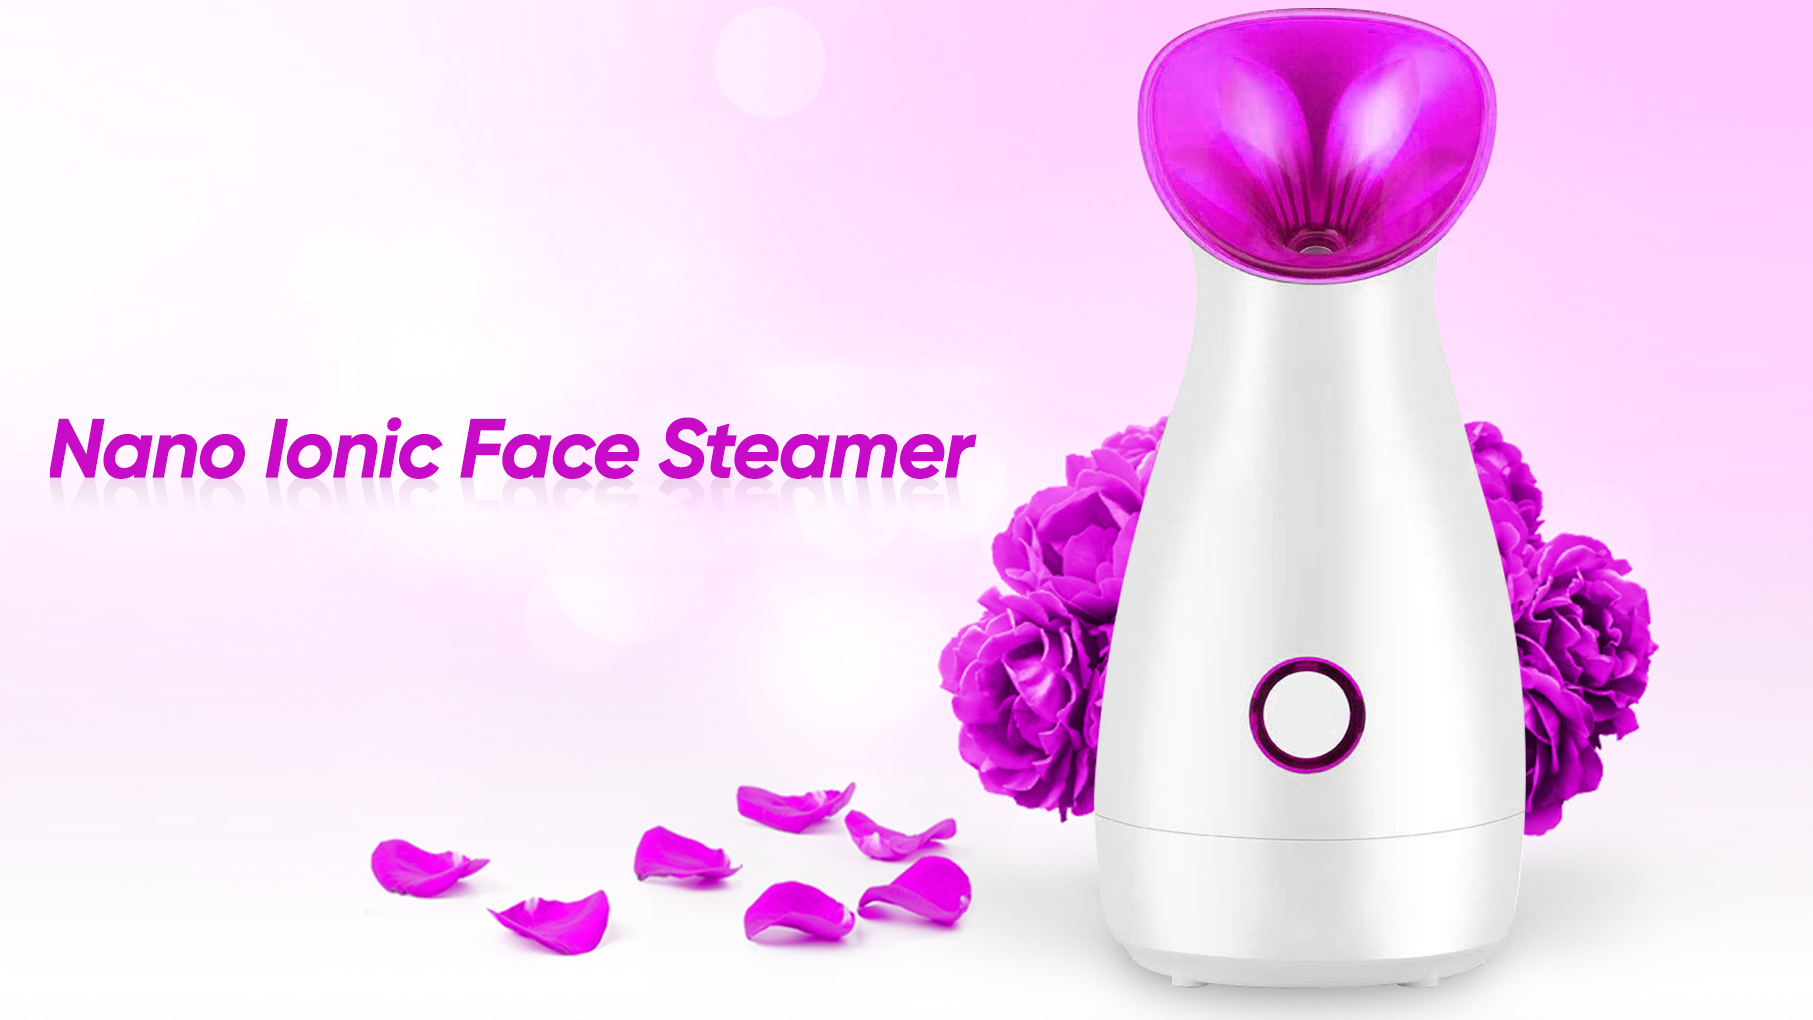 ONULISS Kecantikan perawatan Pribadi Wajah Steamer Sprayer Wajah Humidifier Steamer Wajah